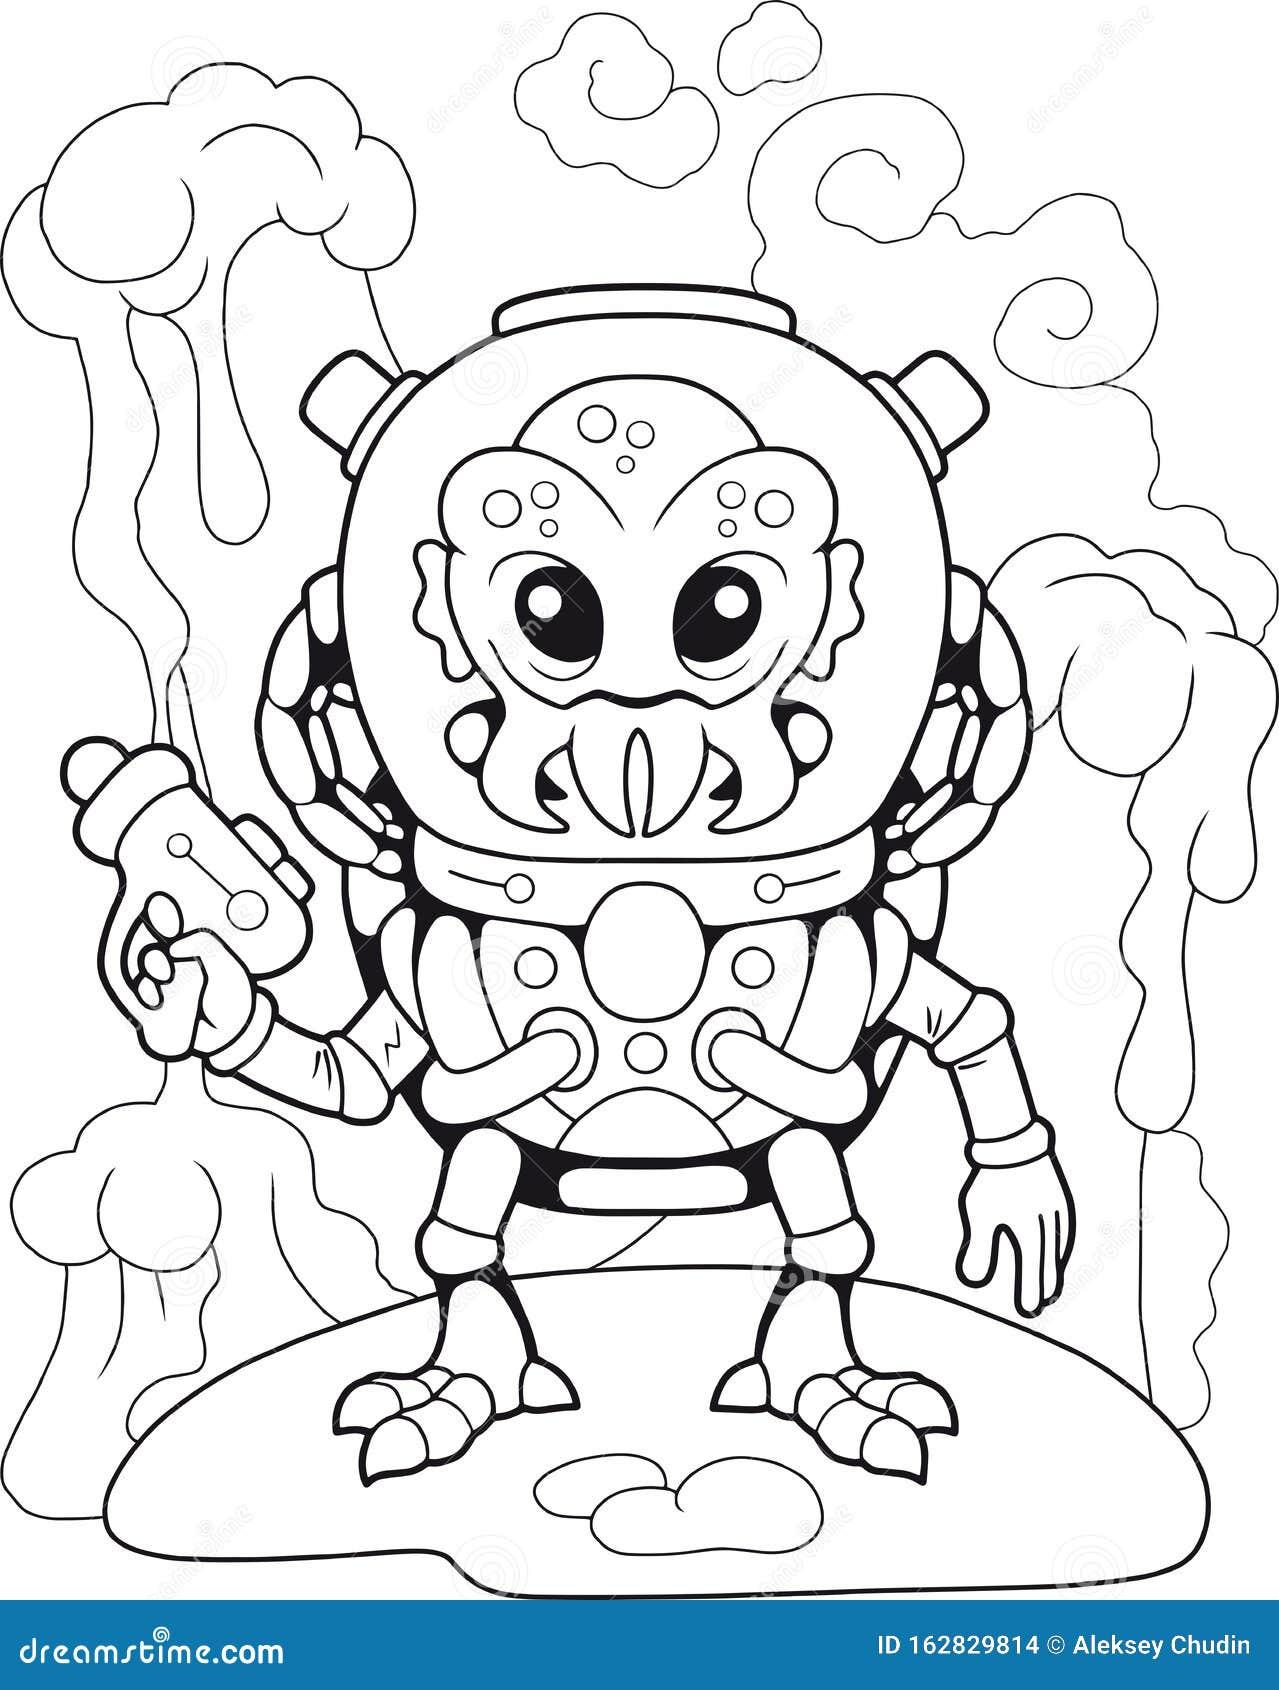 Alien Coloring Stock Illustrations 2 092 Alien Coloring Stock Illustrations Vectors Clipart Dreamstime